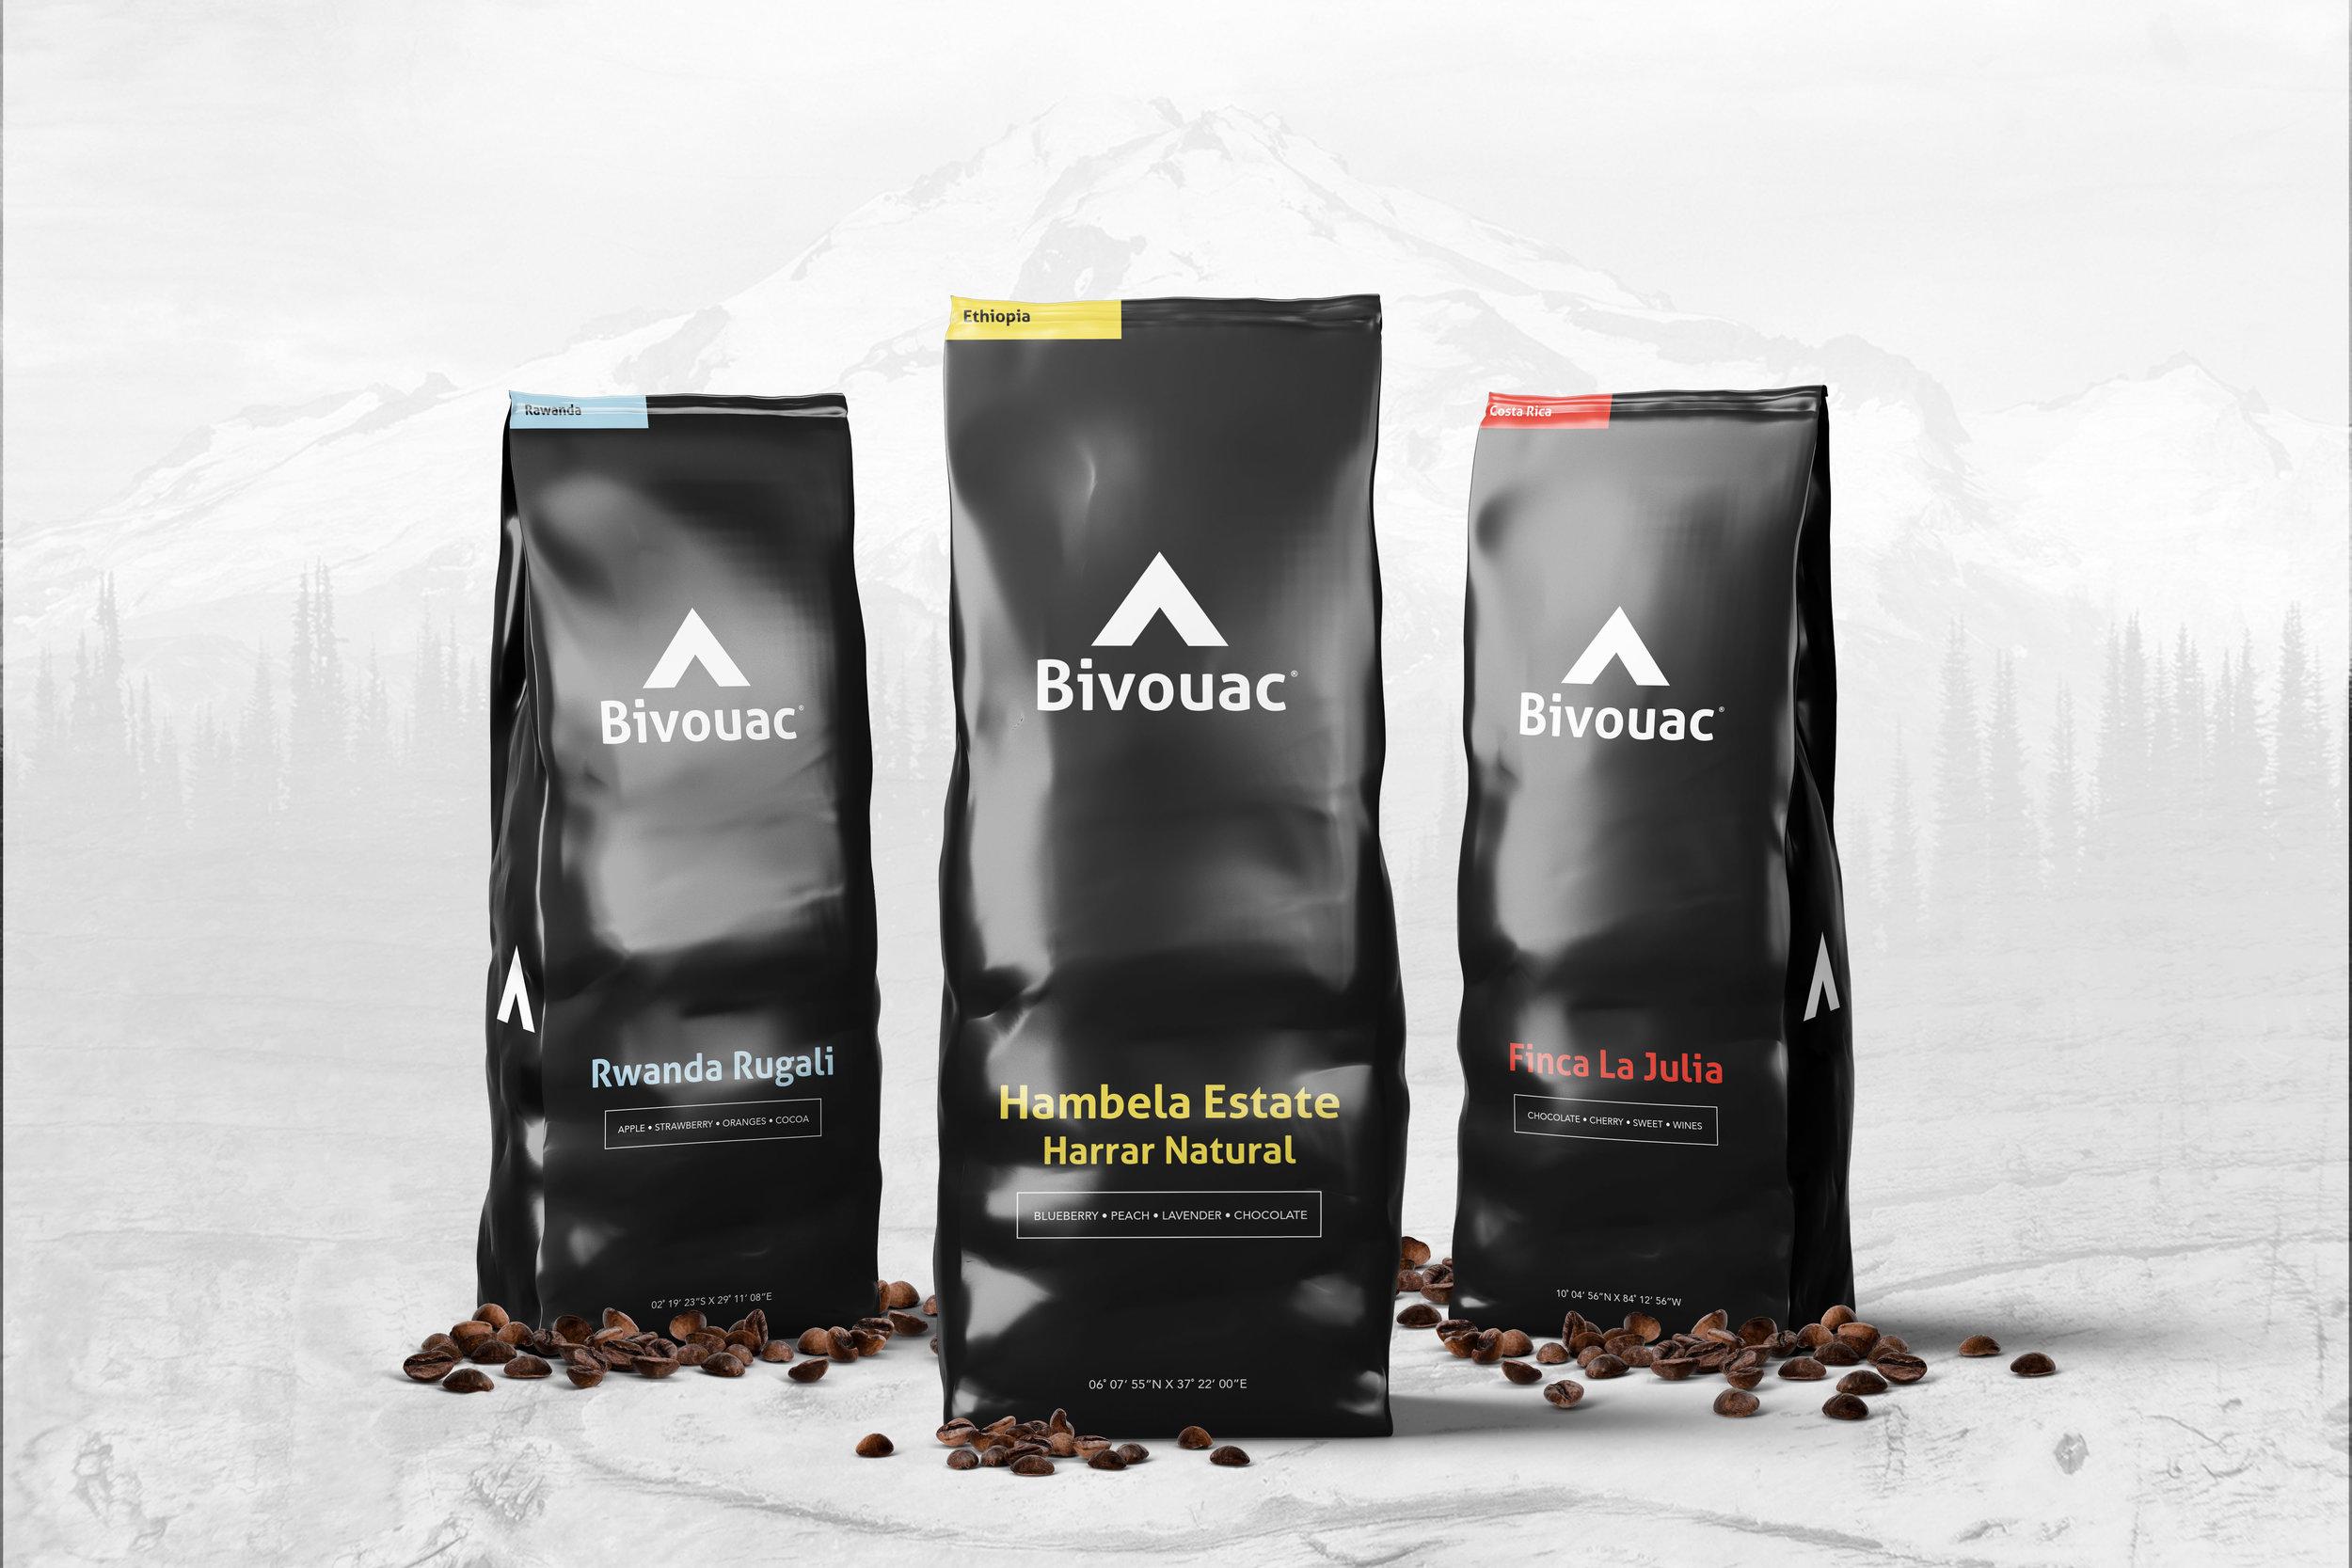 bivouac_three_coffee_packages.jpg